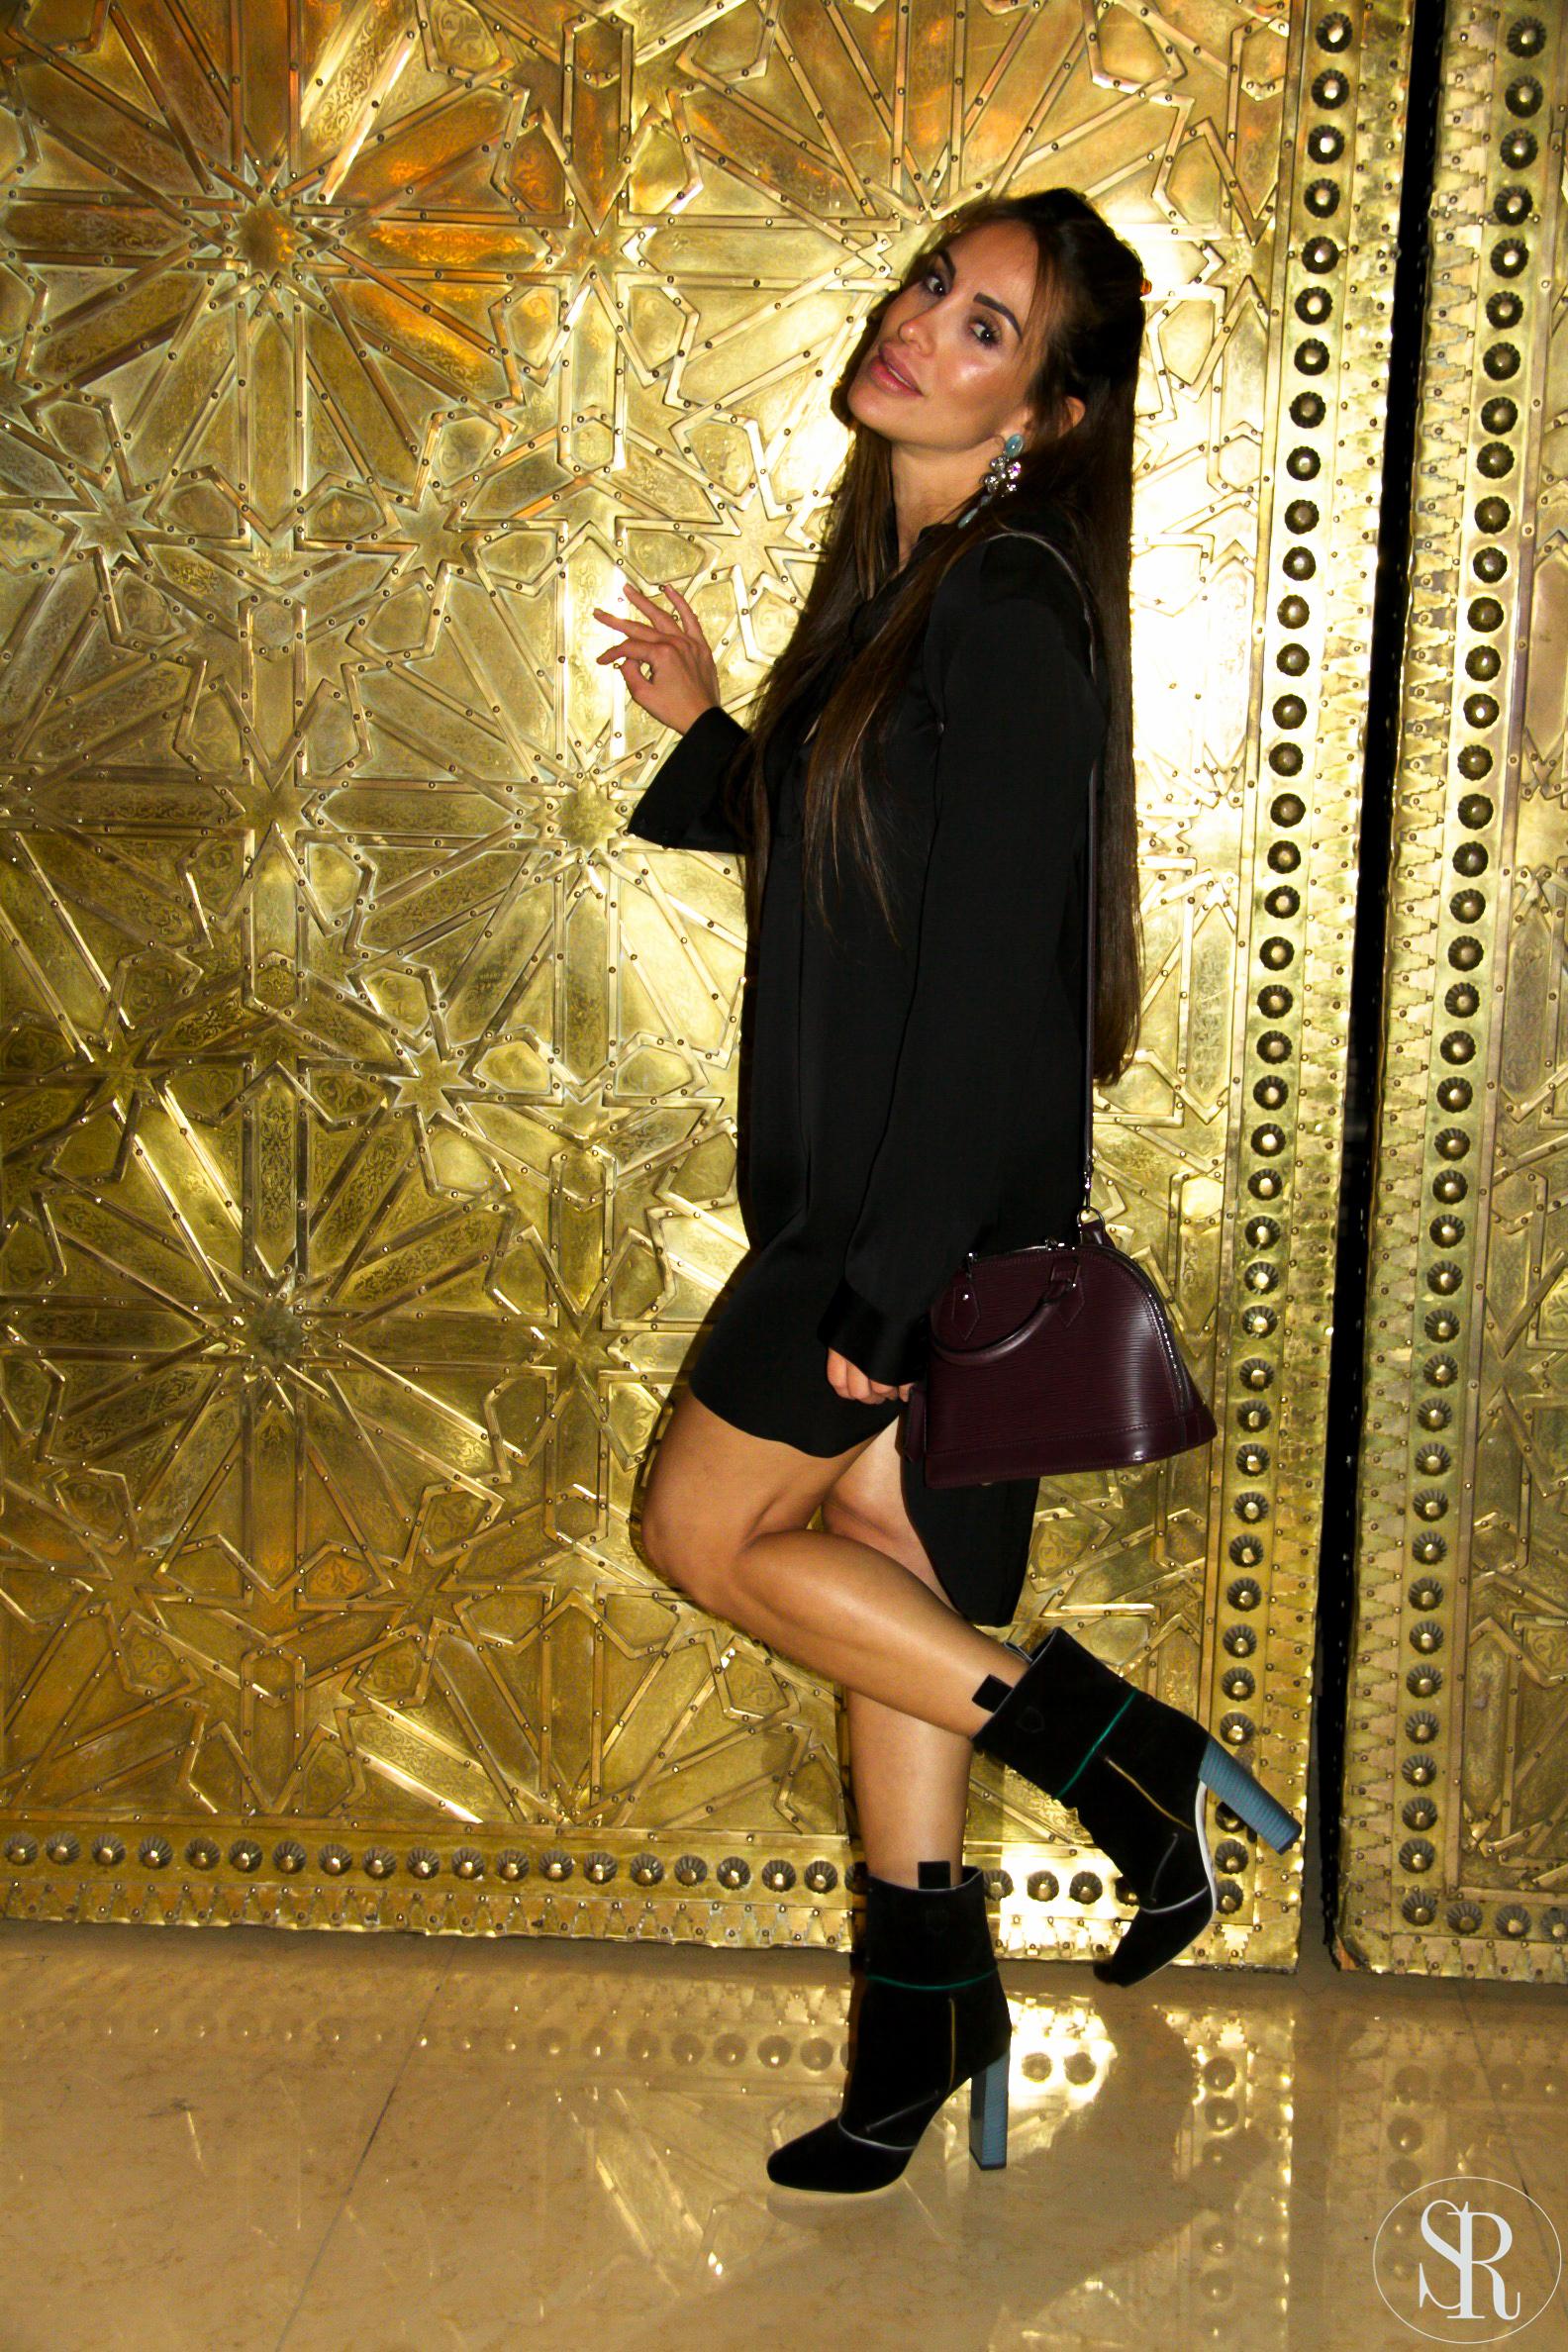 VIP launch of MANOLO BLAHNIK collection Fashion Afternoon Tea by Raffles Dubai-4074.jpg